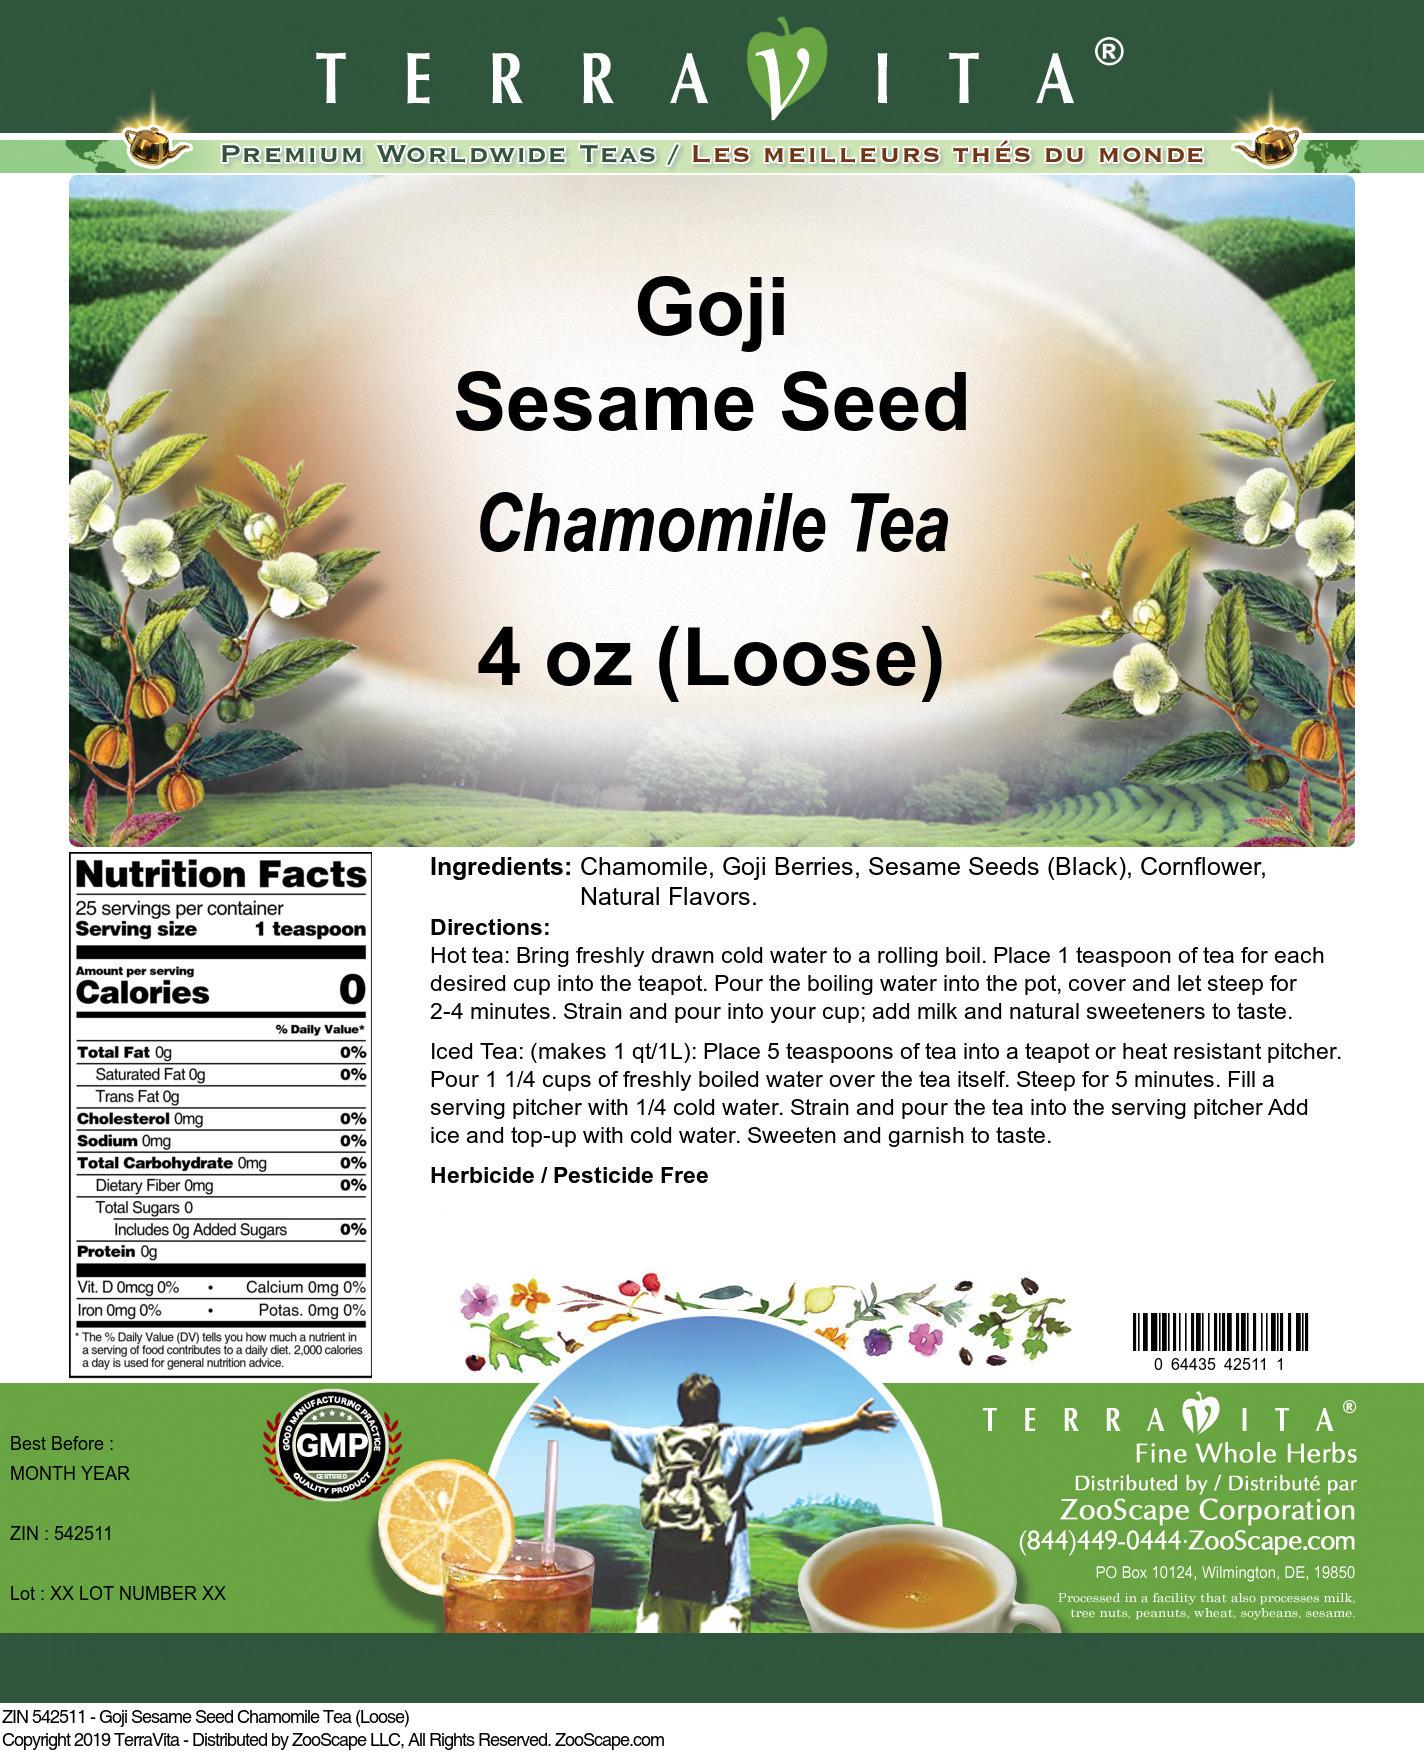 Goji Sesame Seed Chamomile Tea (Loose)